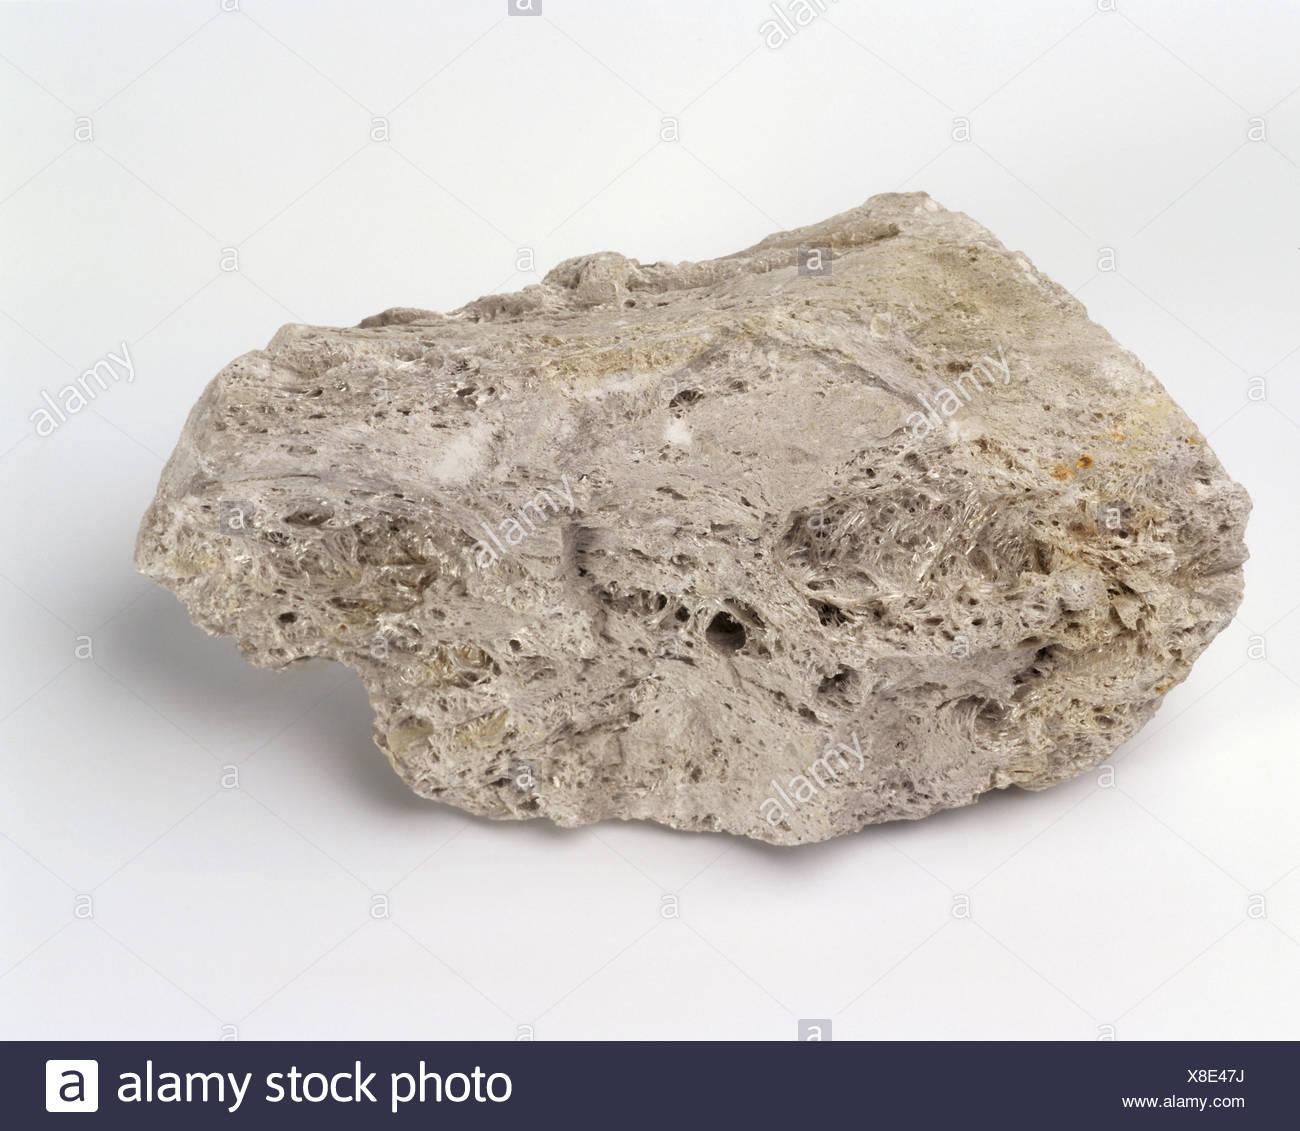 Igneous rock : Pumice - Stock Image